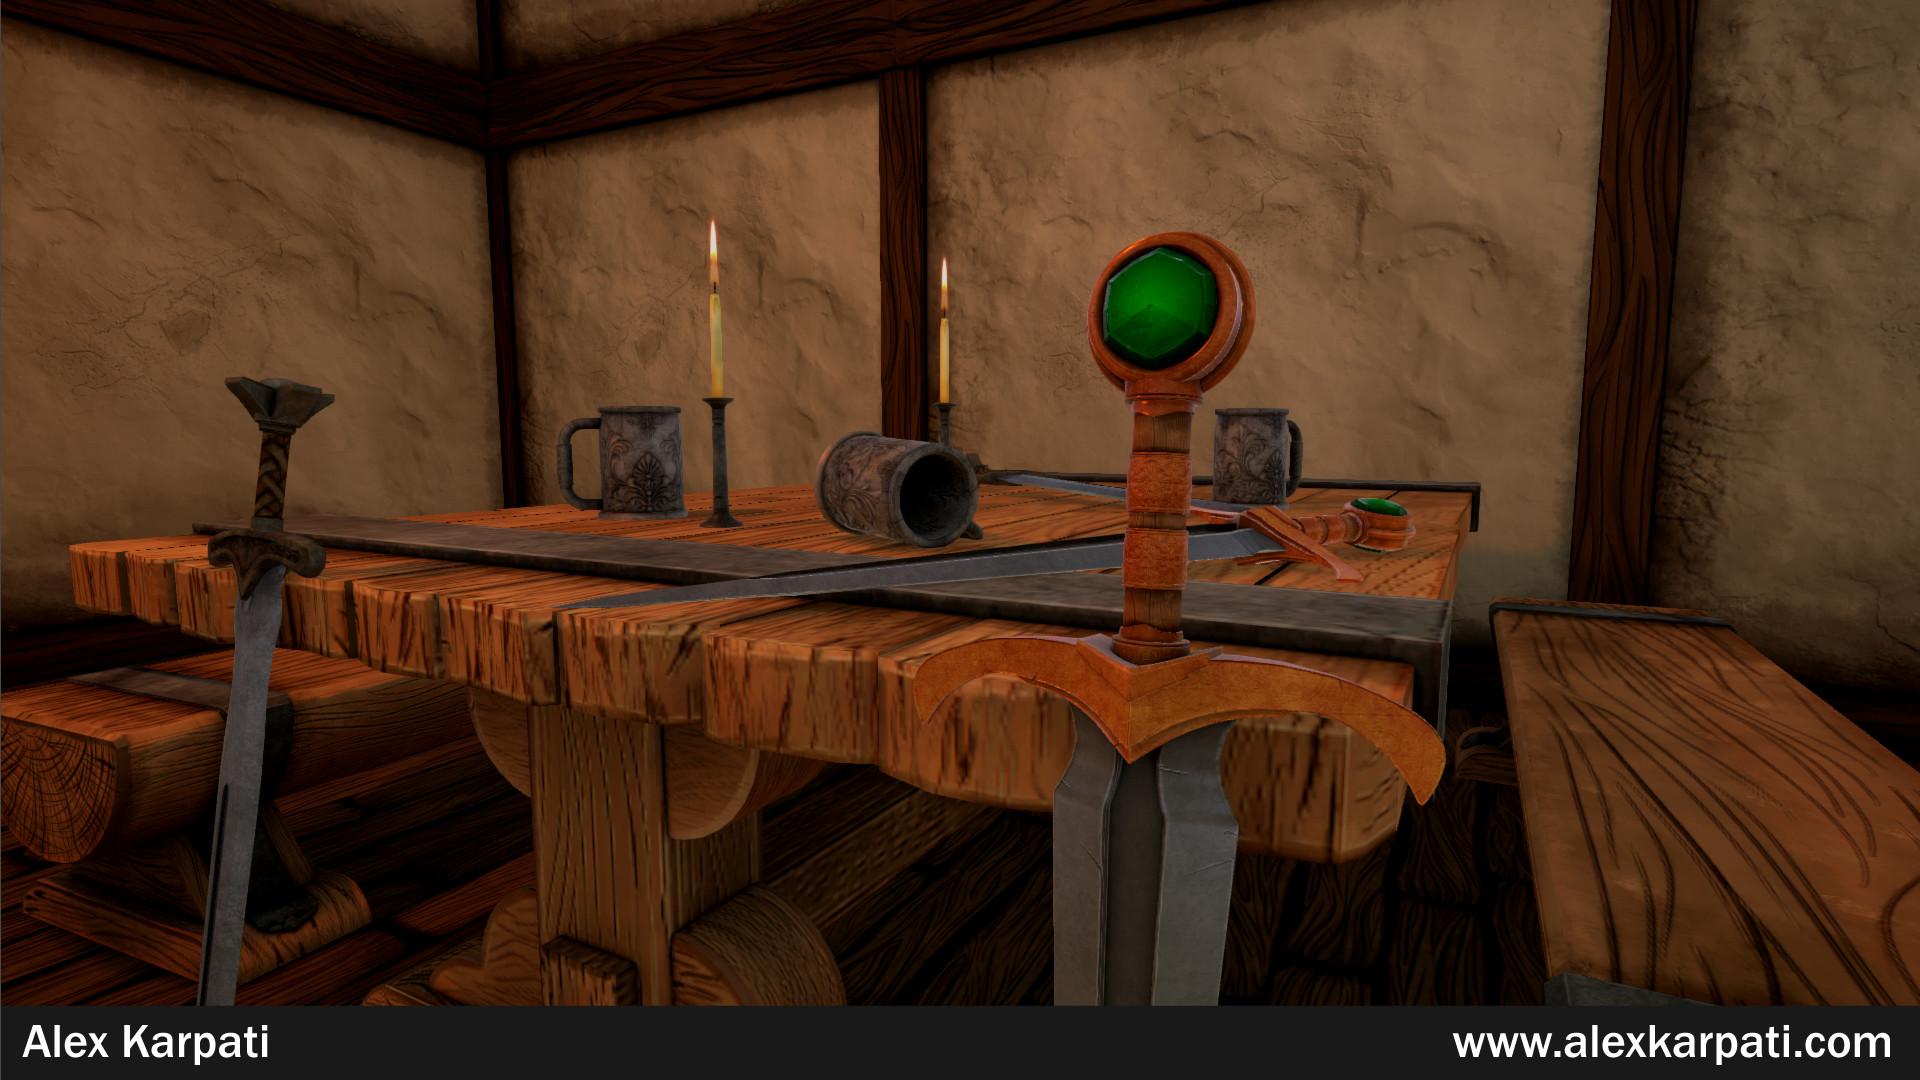 Alex karpati tavern 04 v01